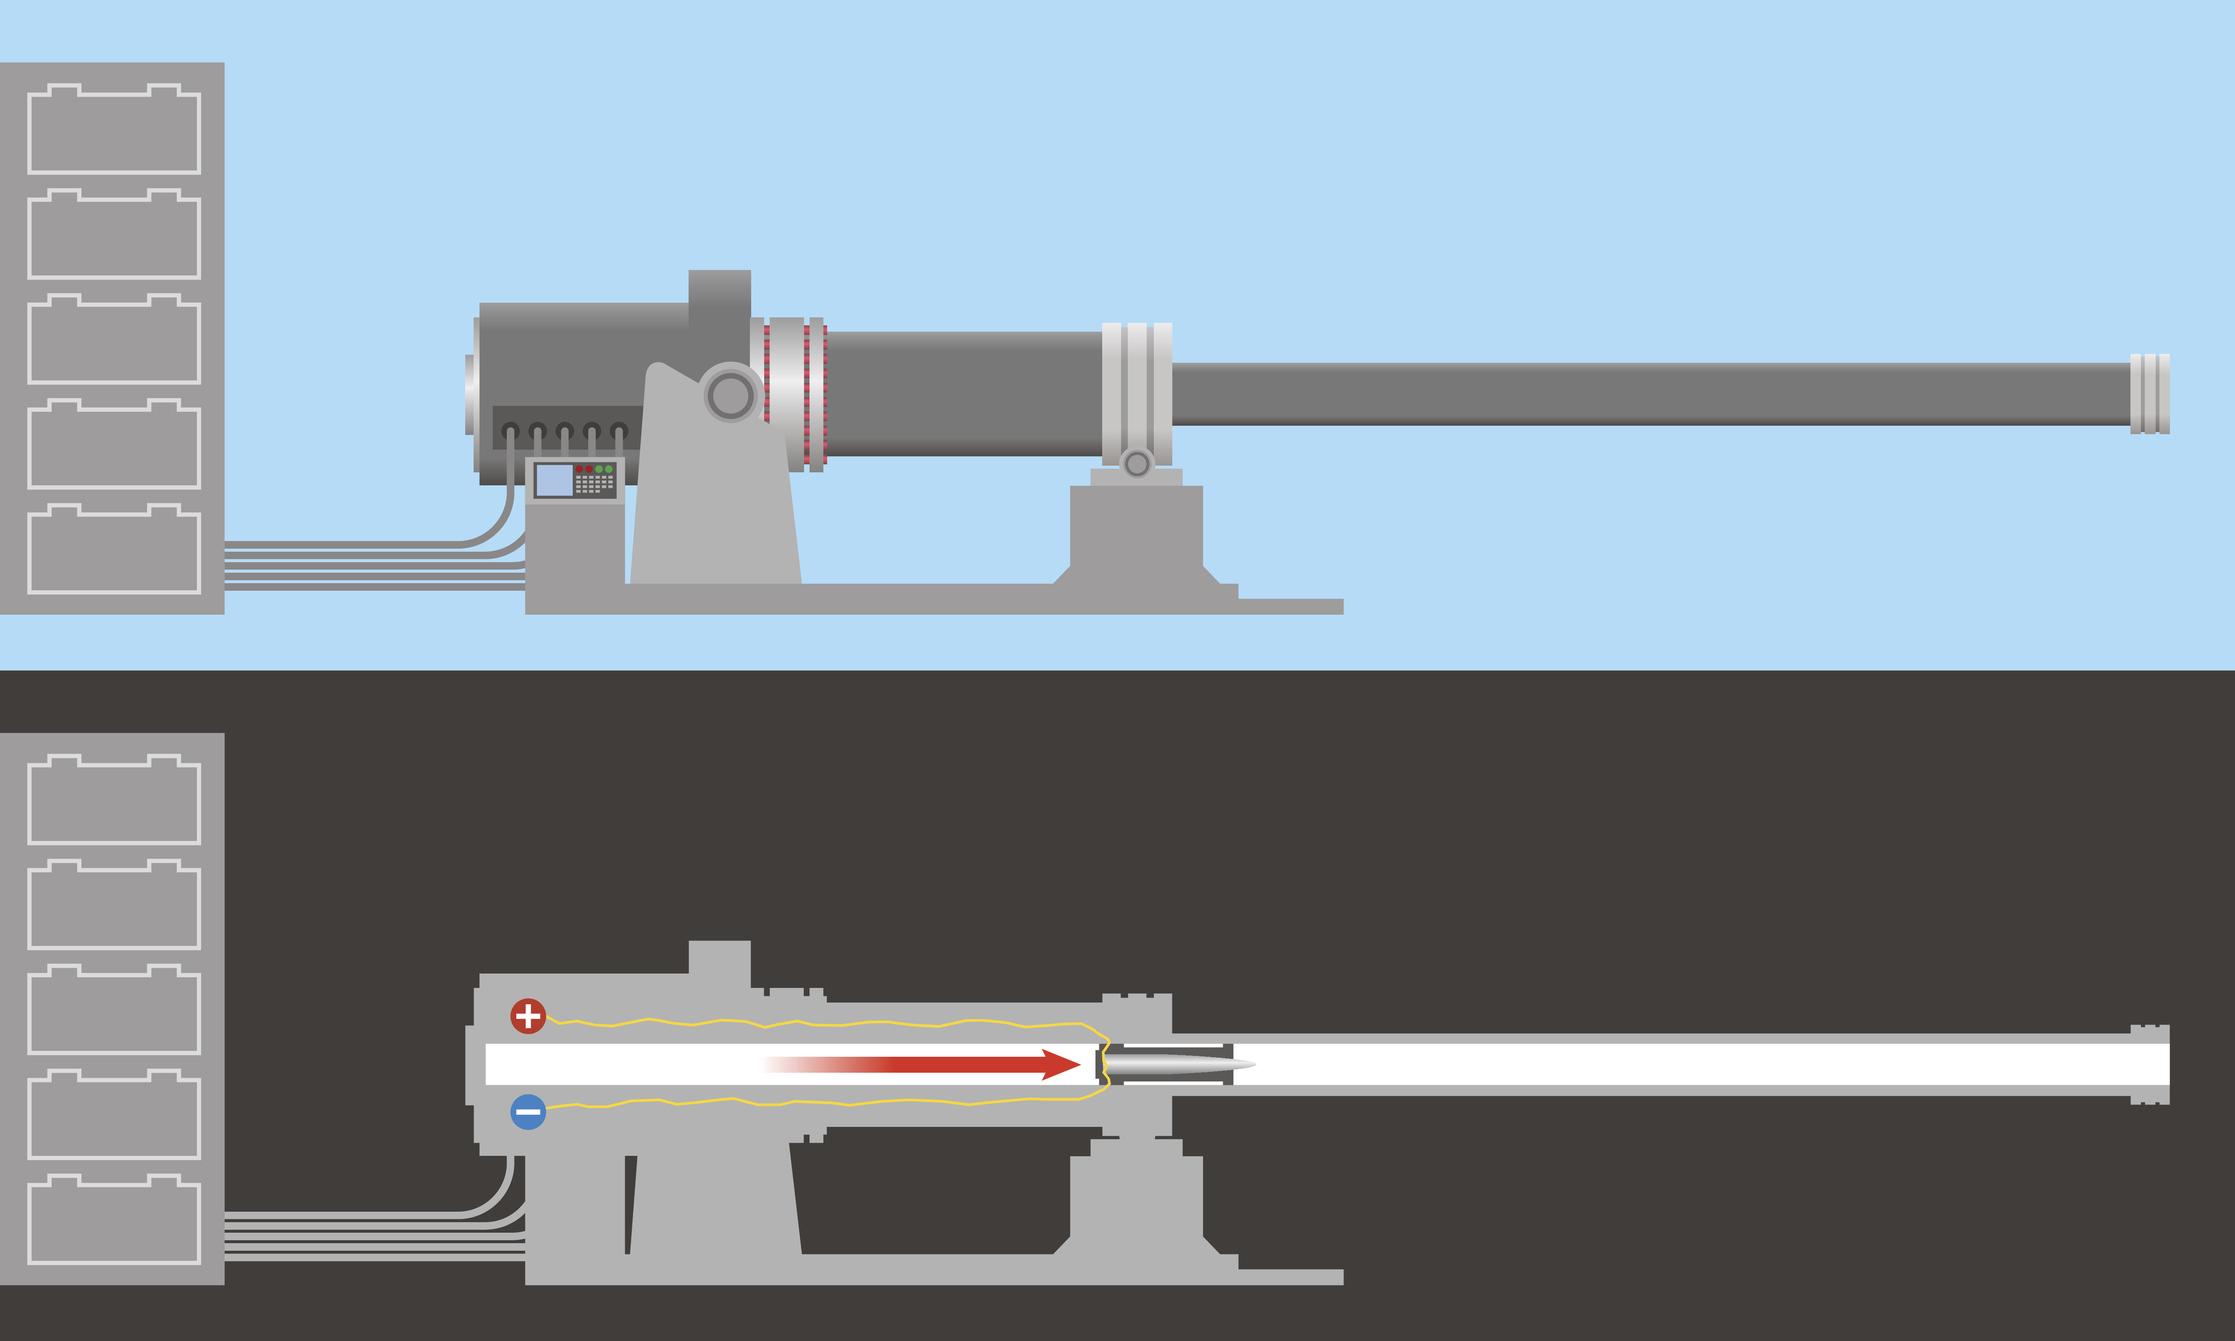 Railgun diagram showing shell moving through barrel